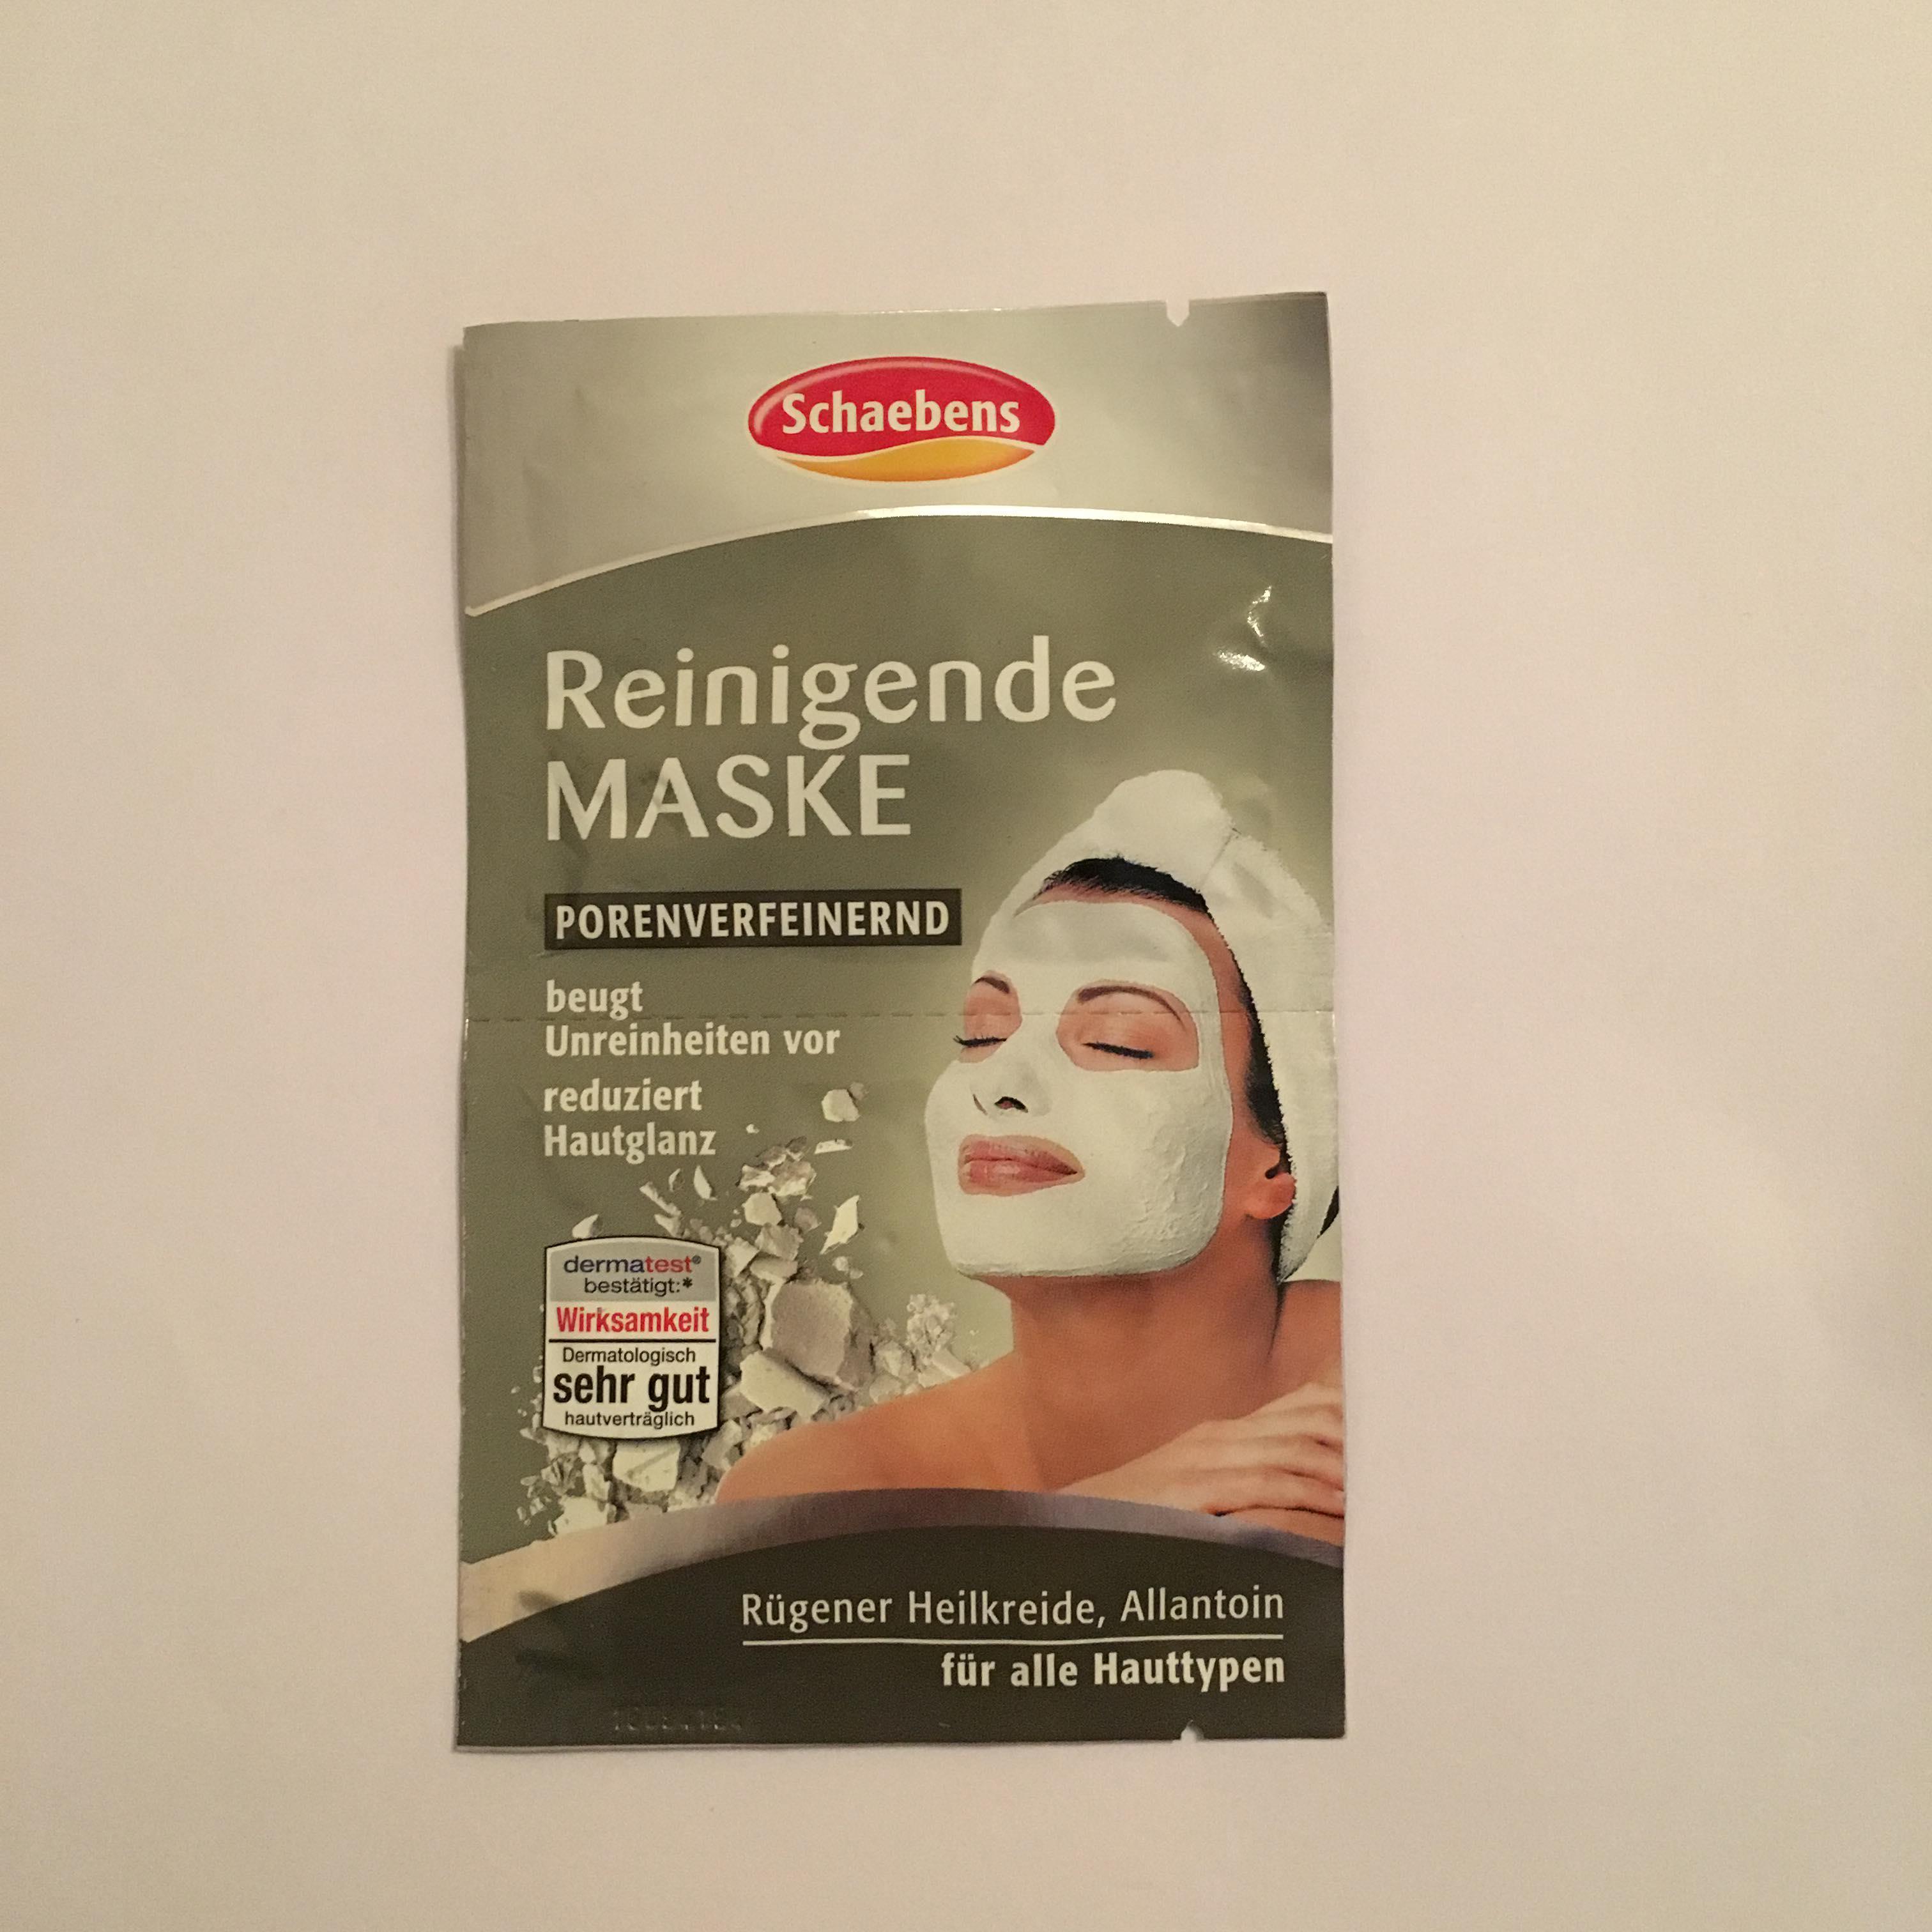 scahebens masca pentru regenerare